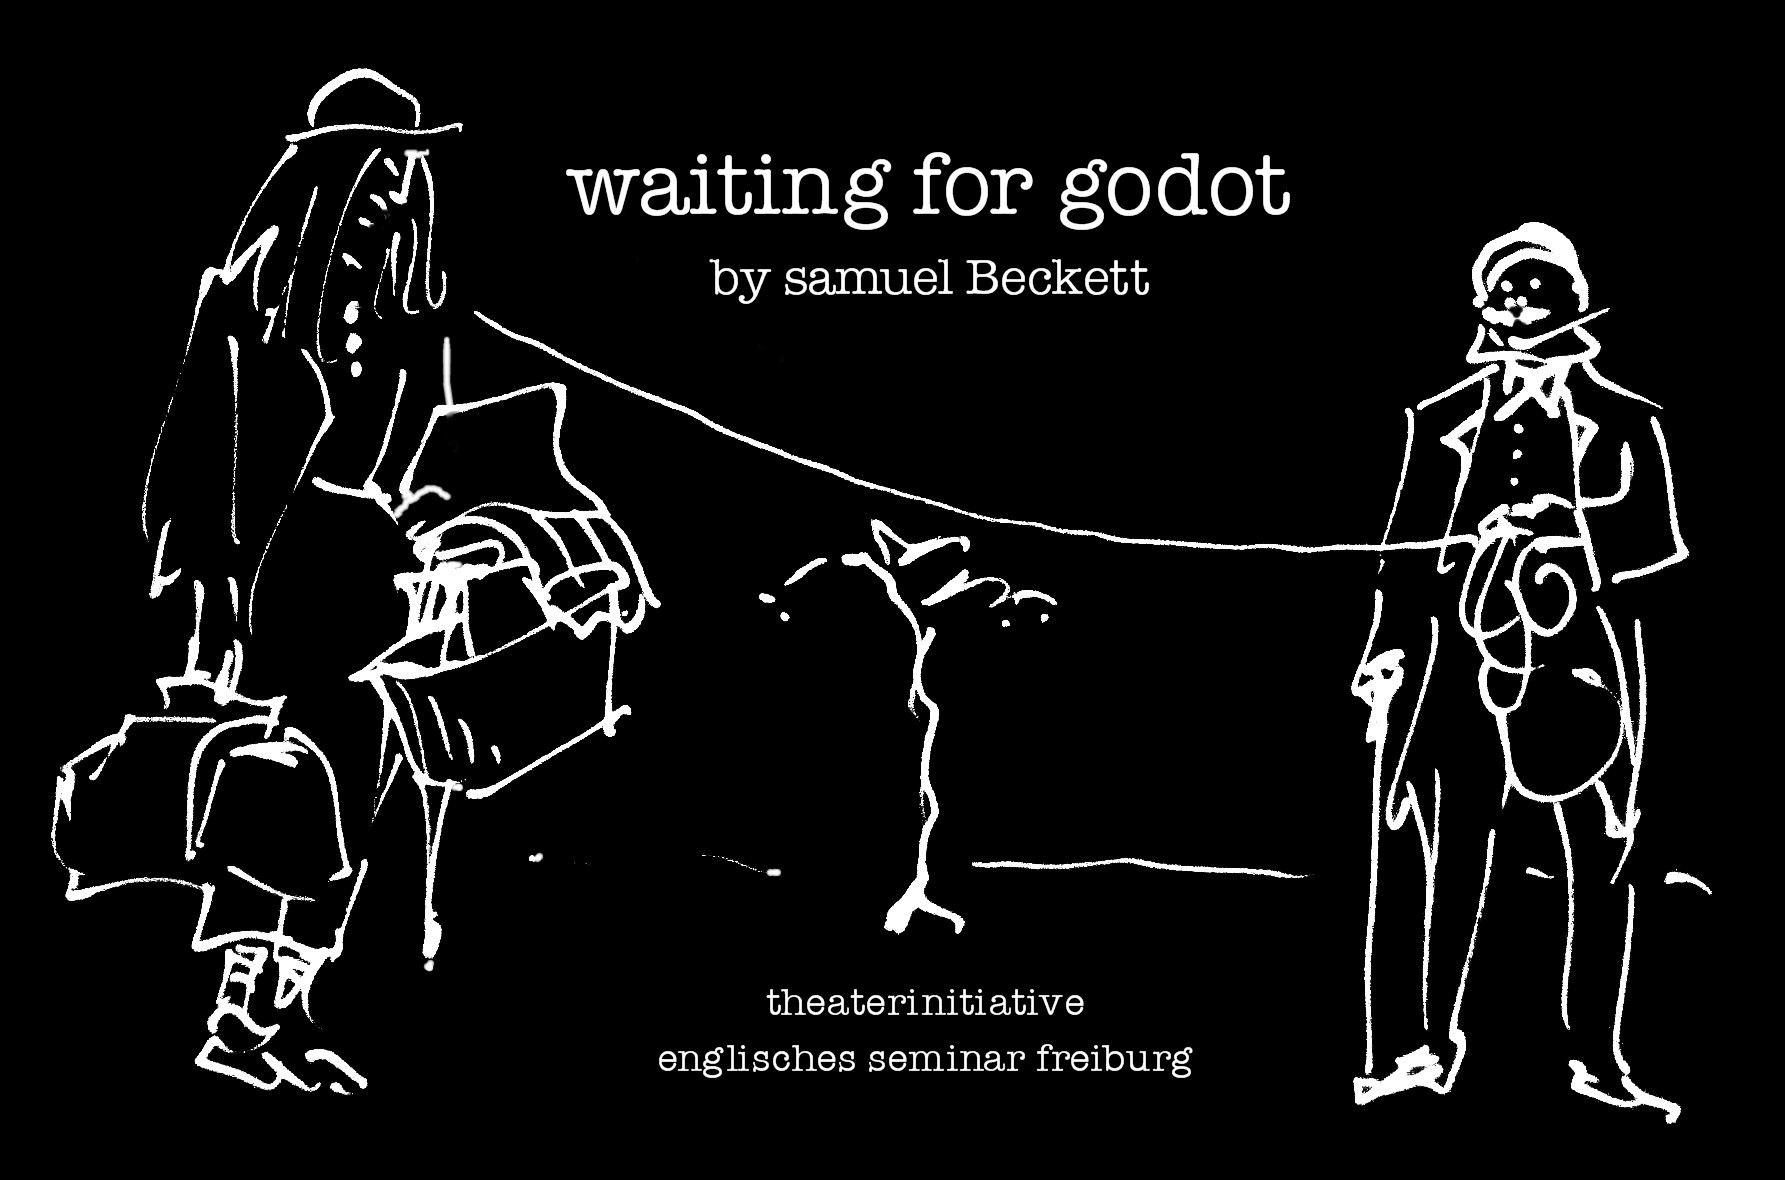 samuel beckett waiting for godot pdf download